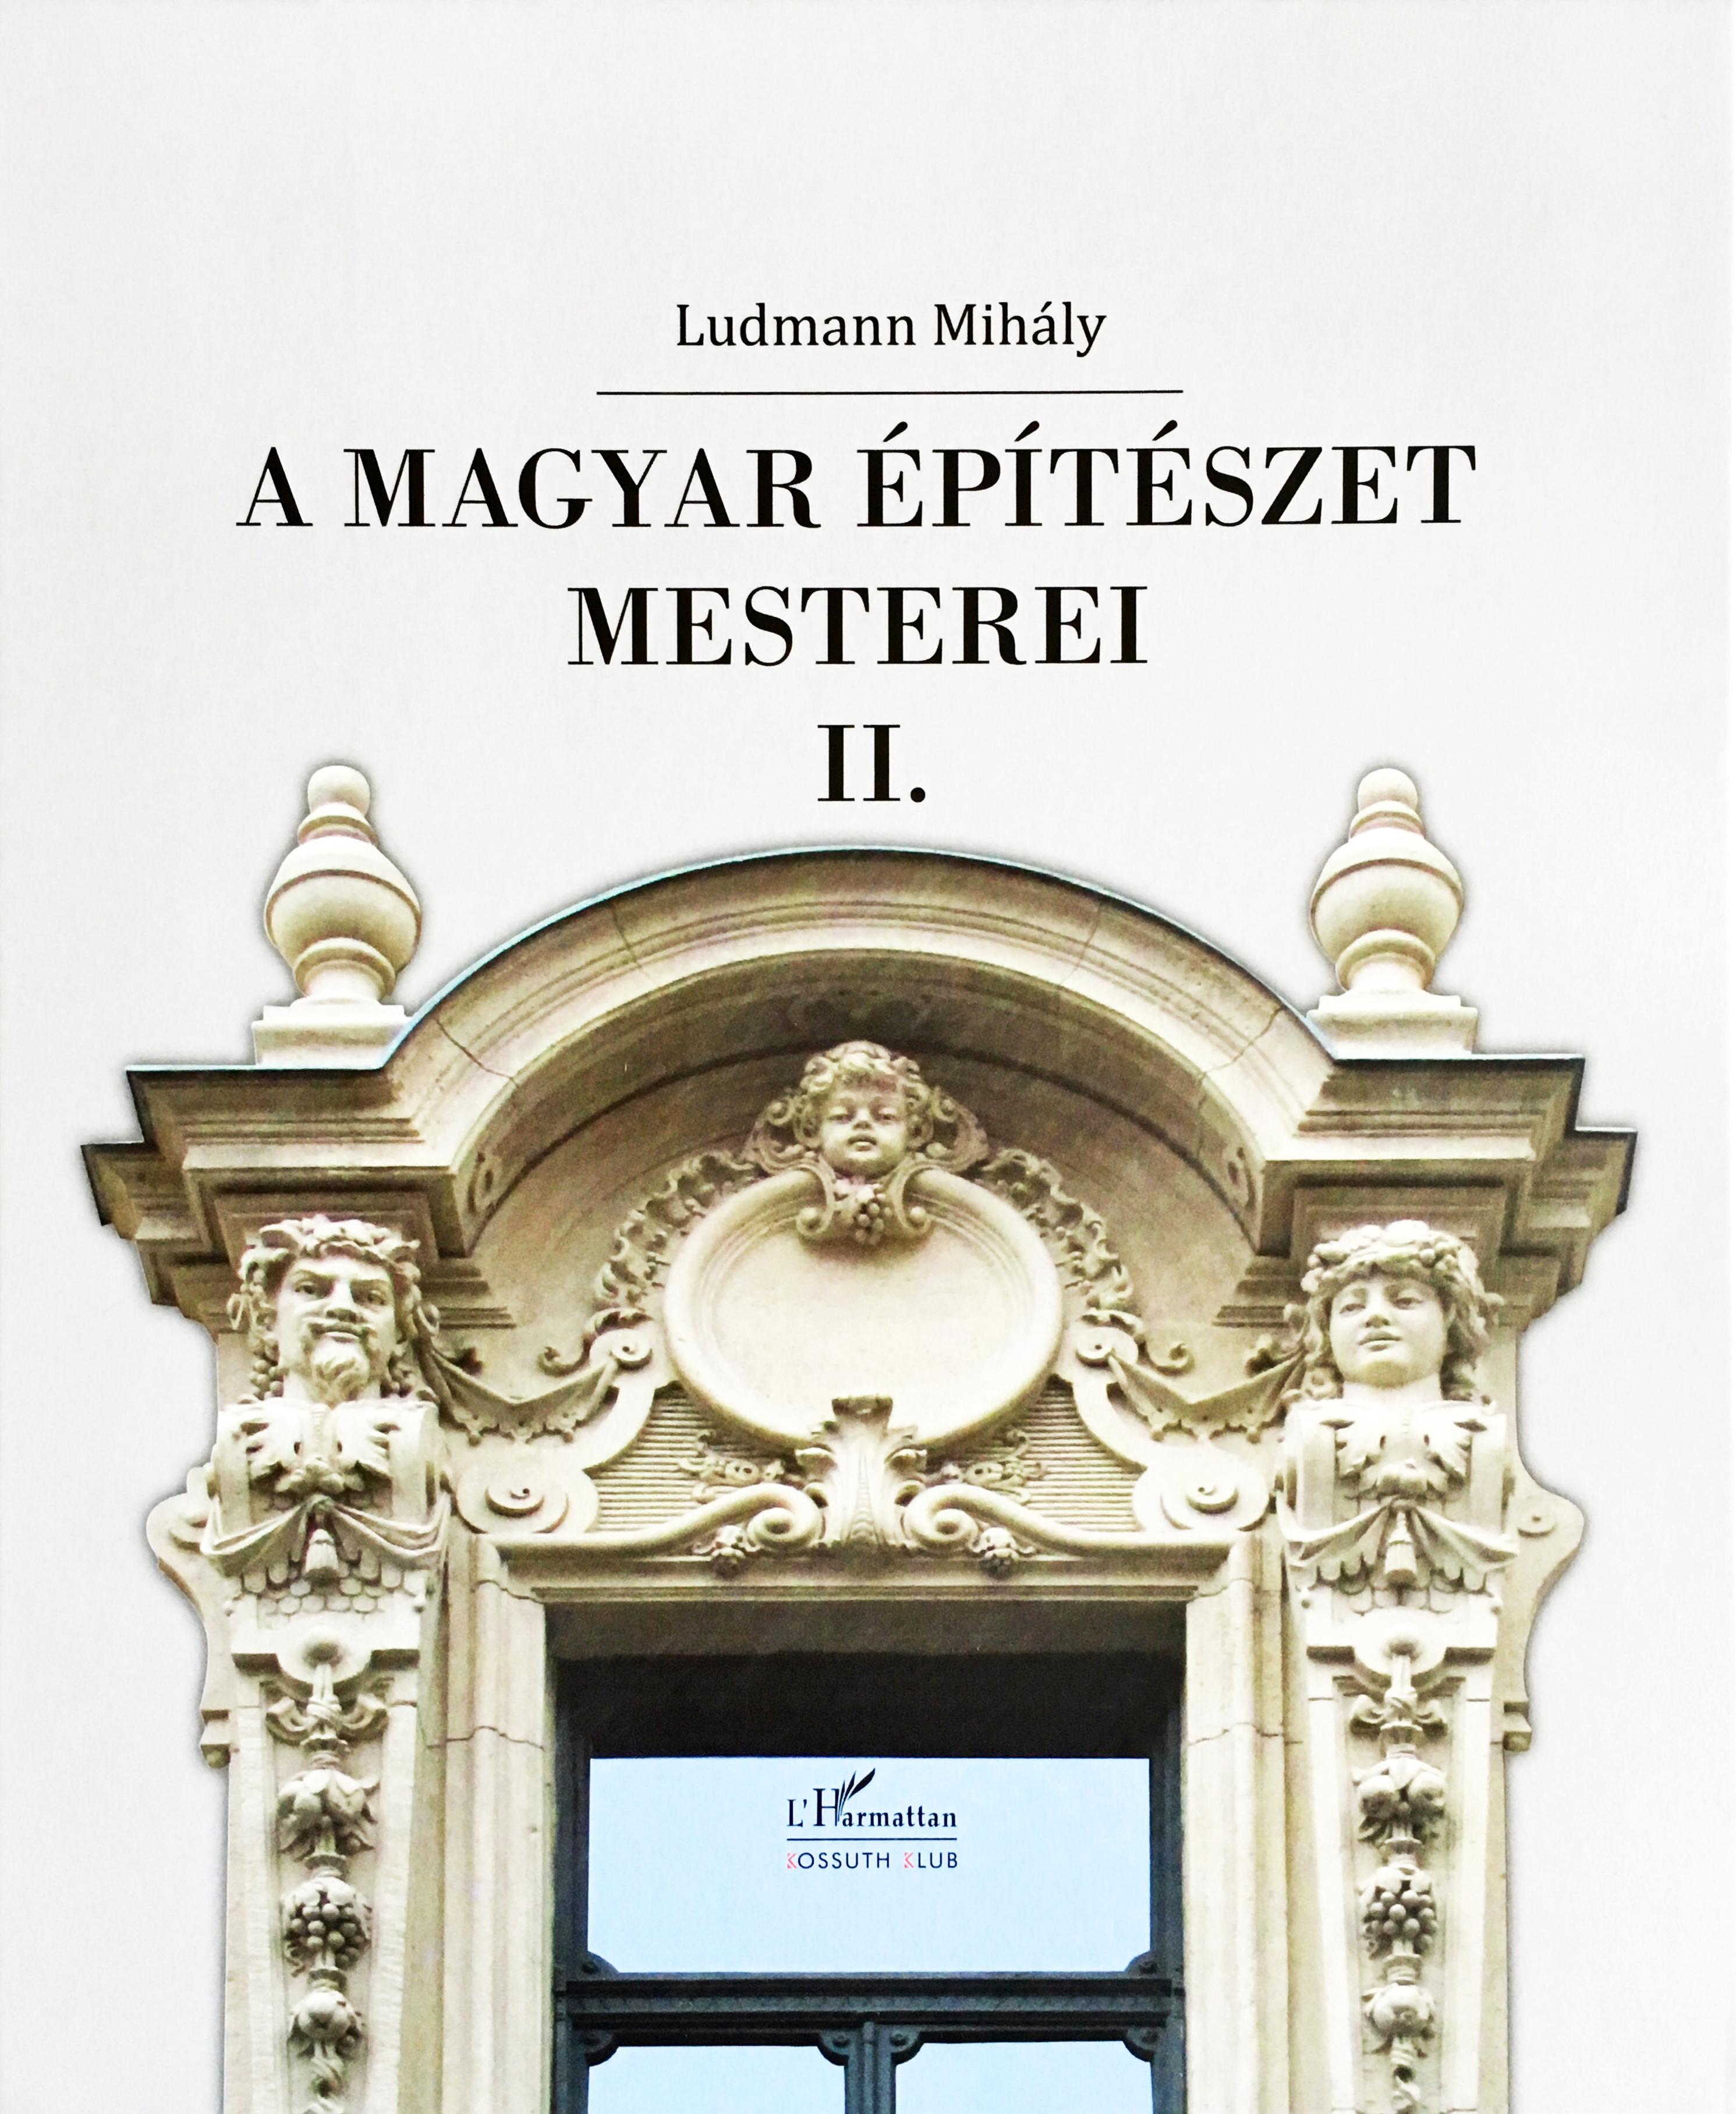 ludmann_mihaly03-02.jpg